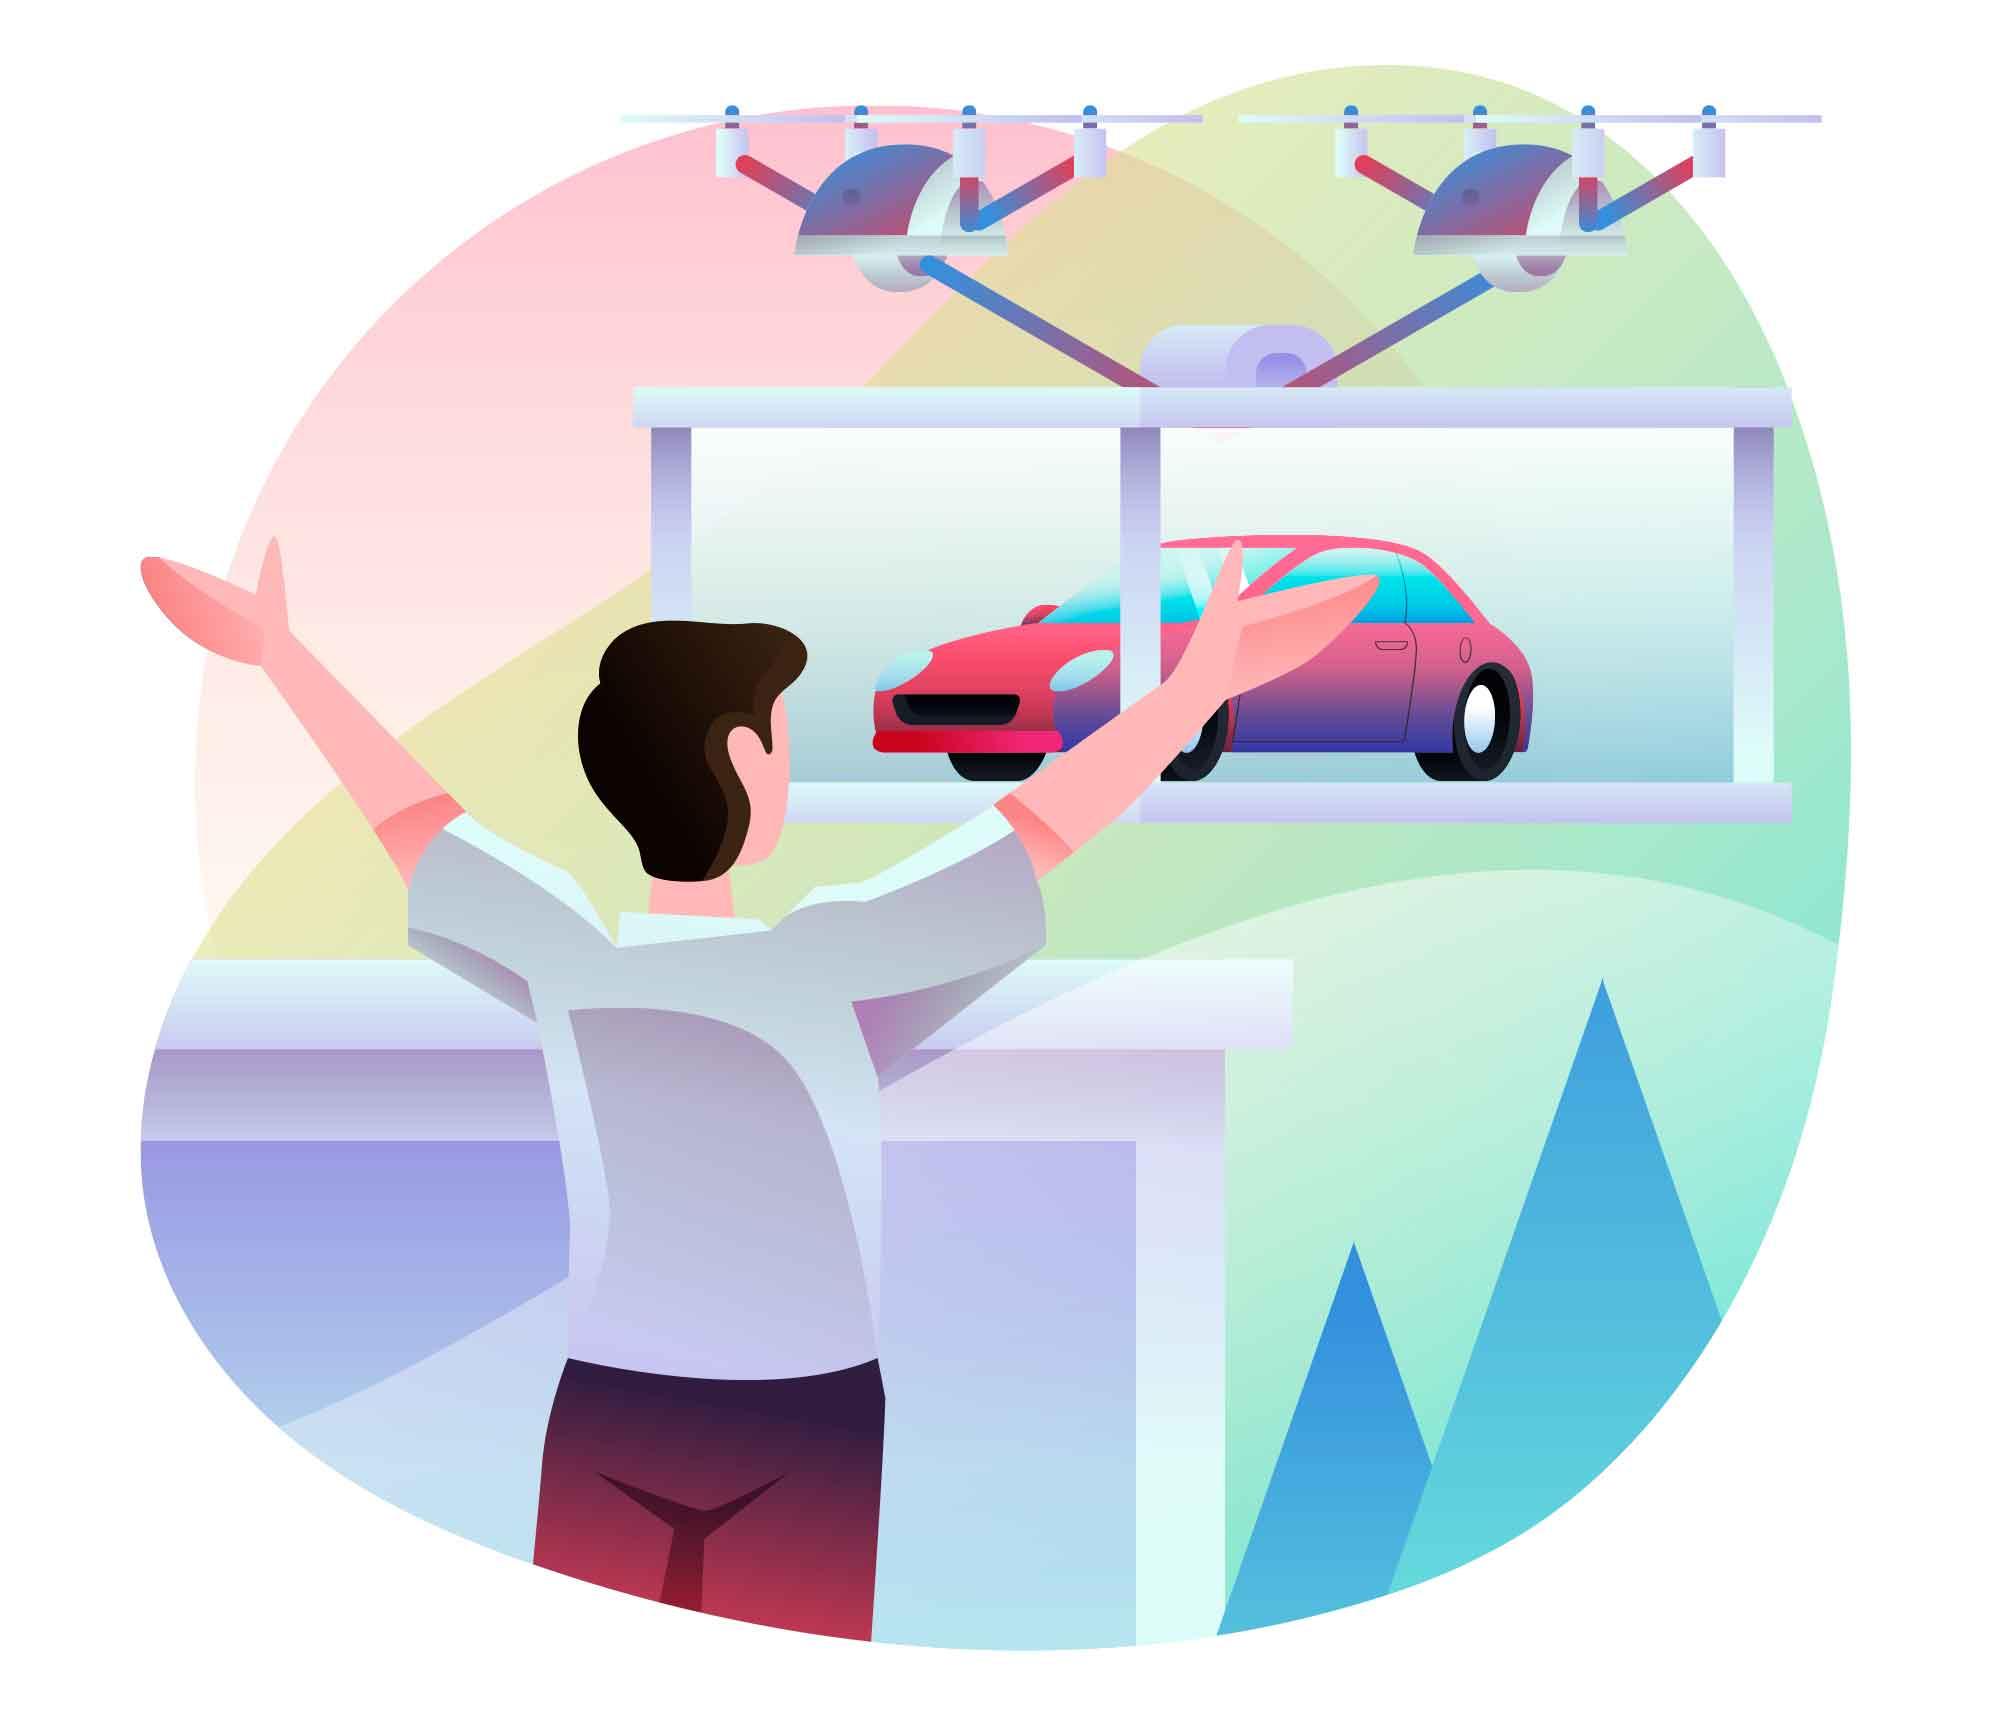 Car Delivered by Drone Illustration